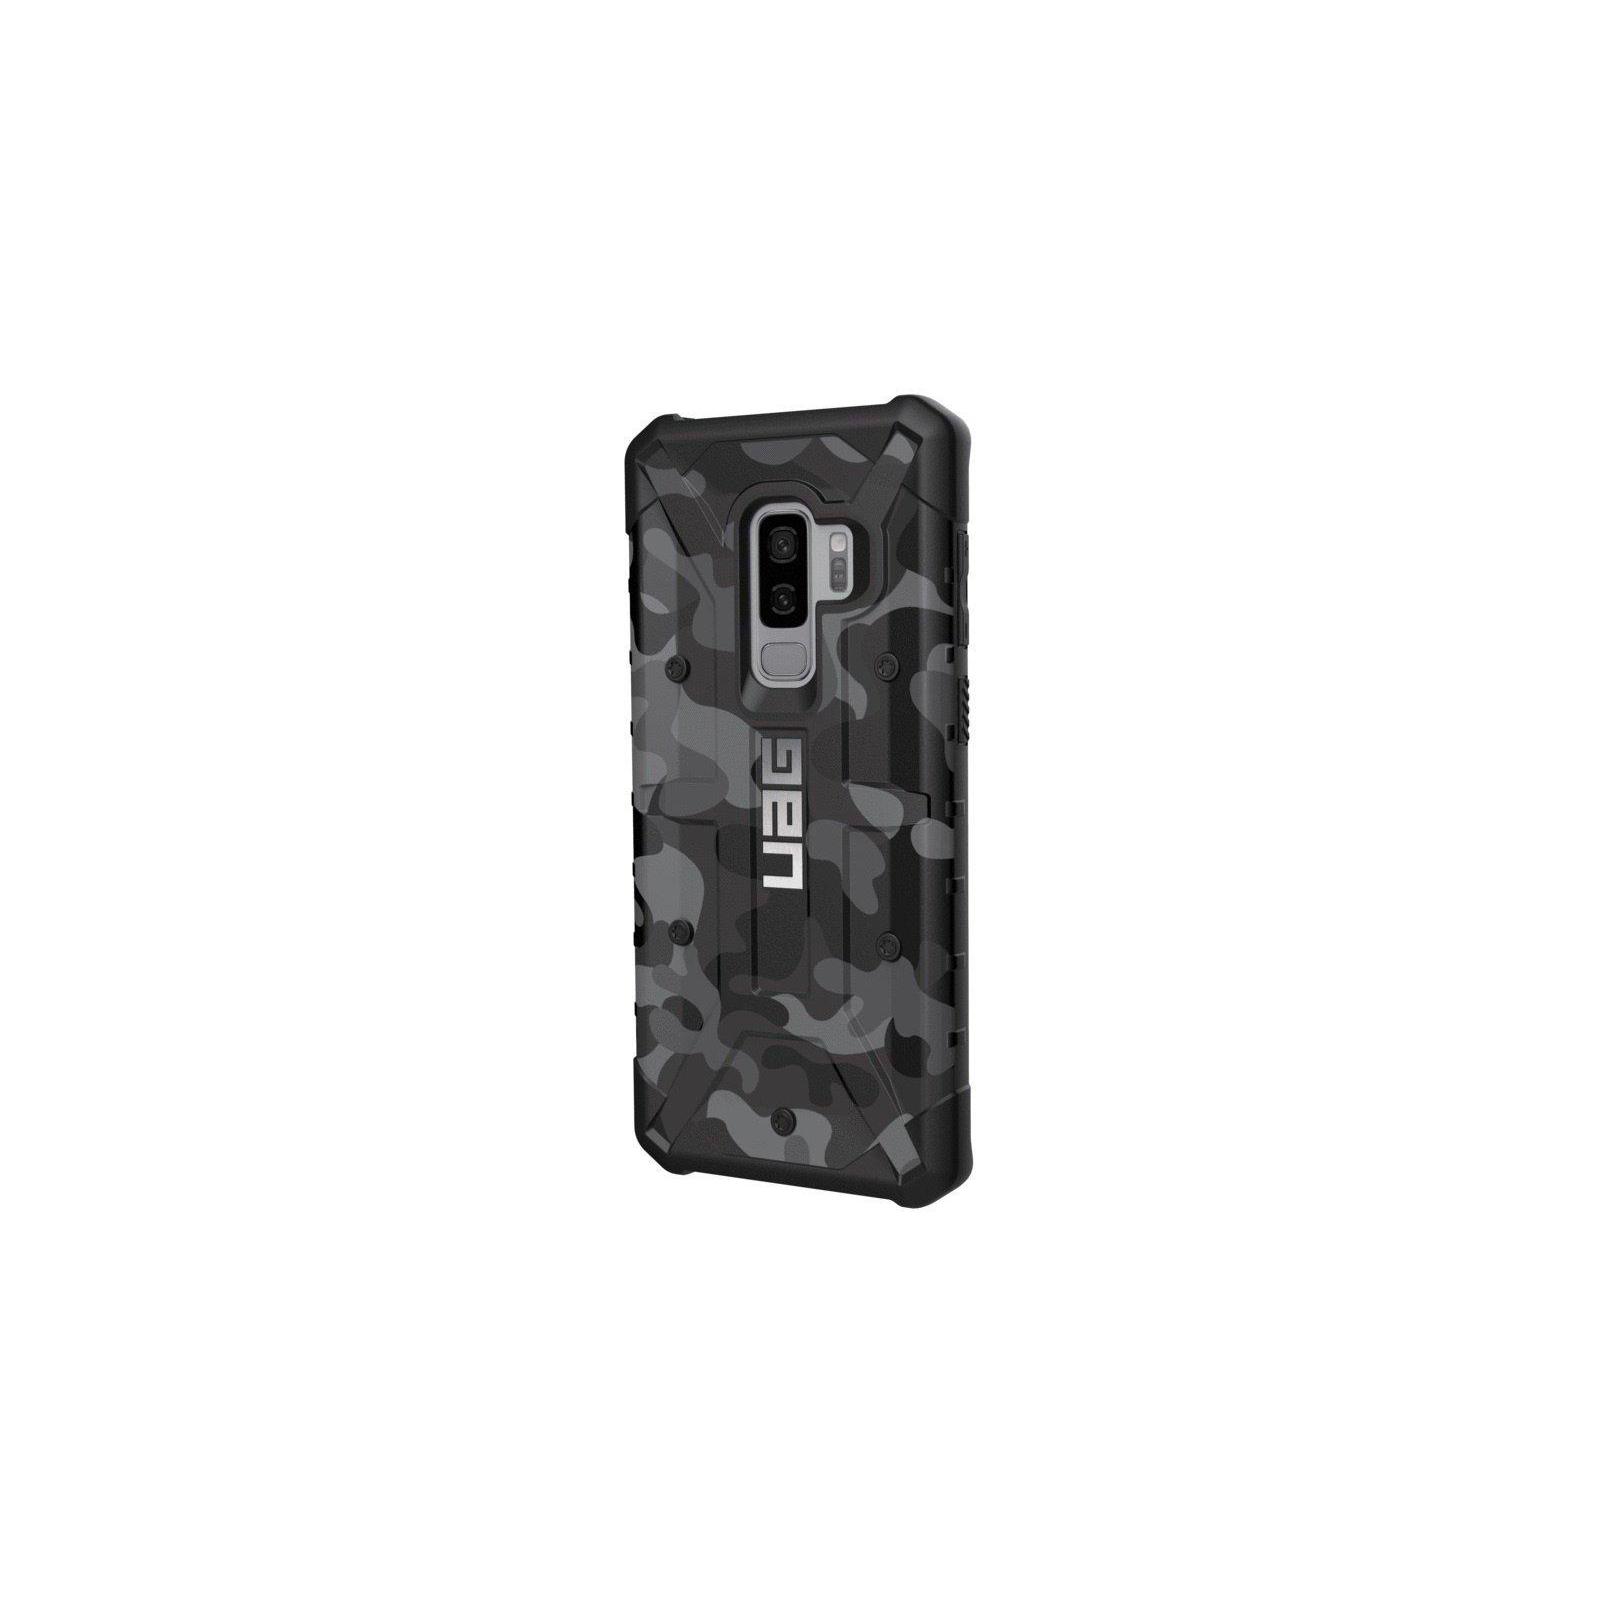 Чехол для моб. телефона Urban Armor Gear Galaxy S9+ Pathfinder Camo Gray/Black (GLXS9PLS-A-BC) изображение 3